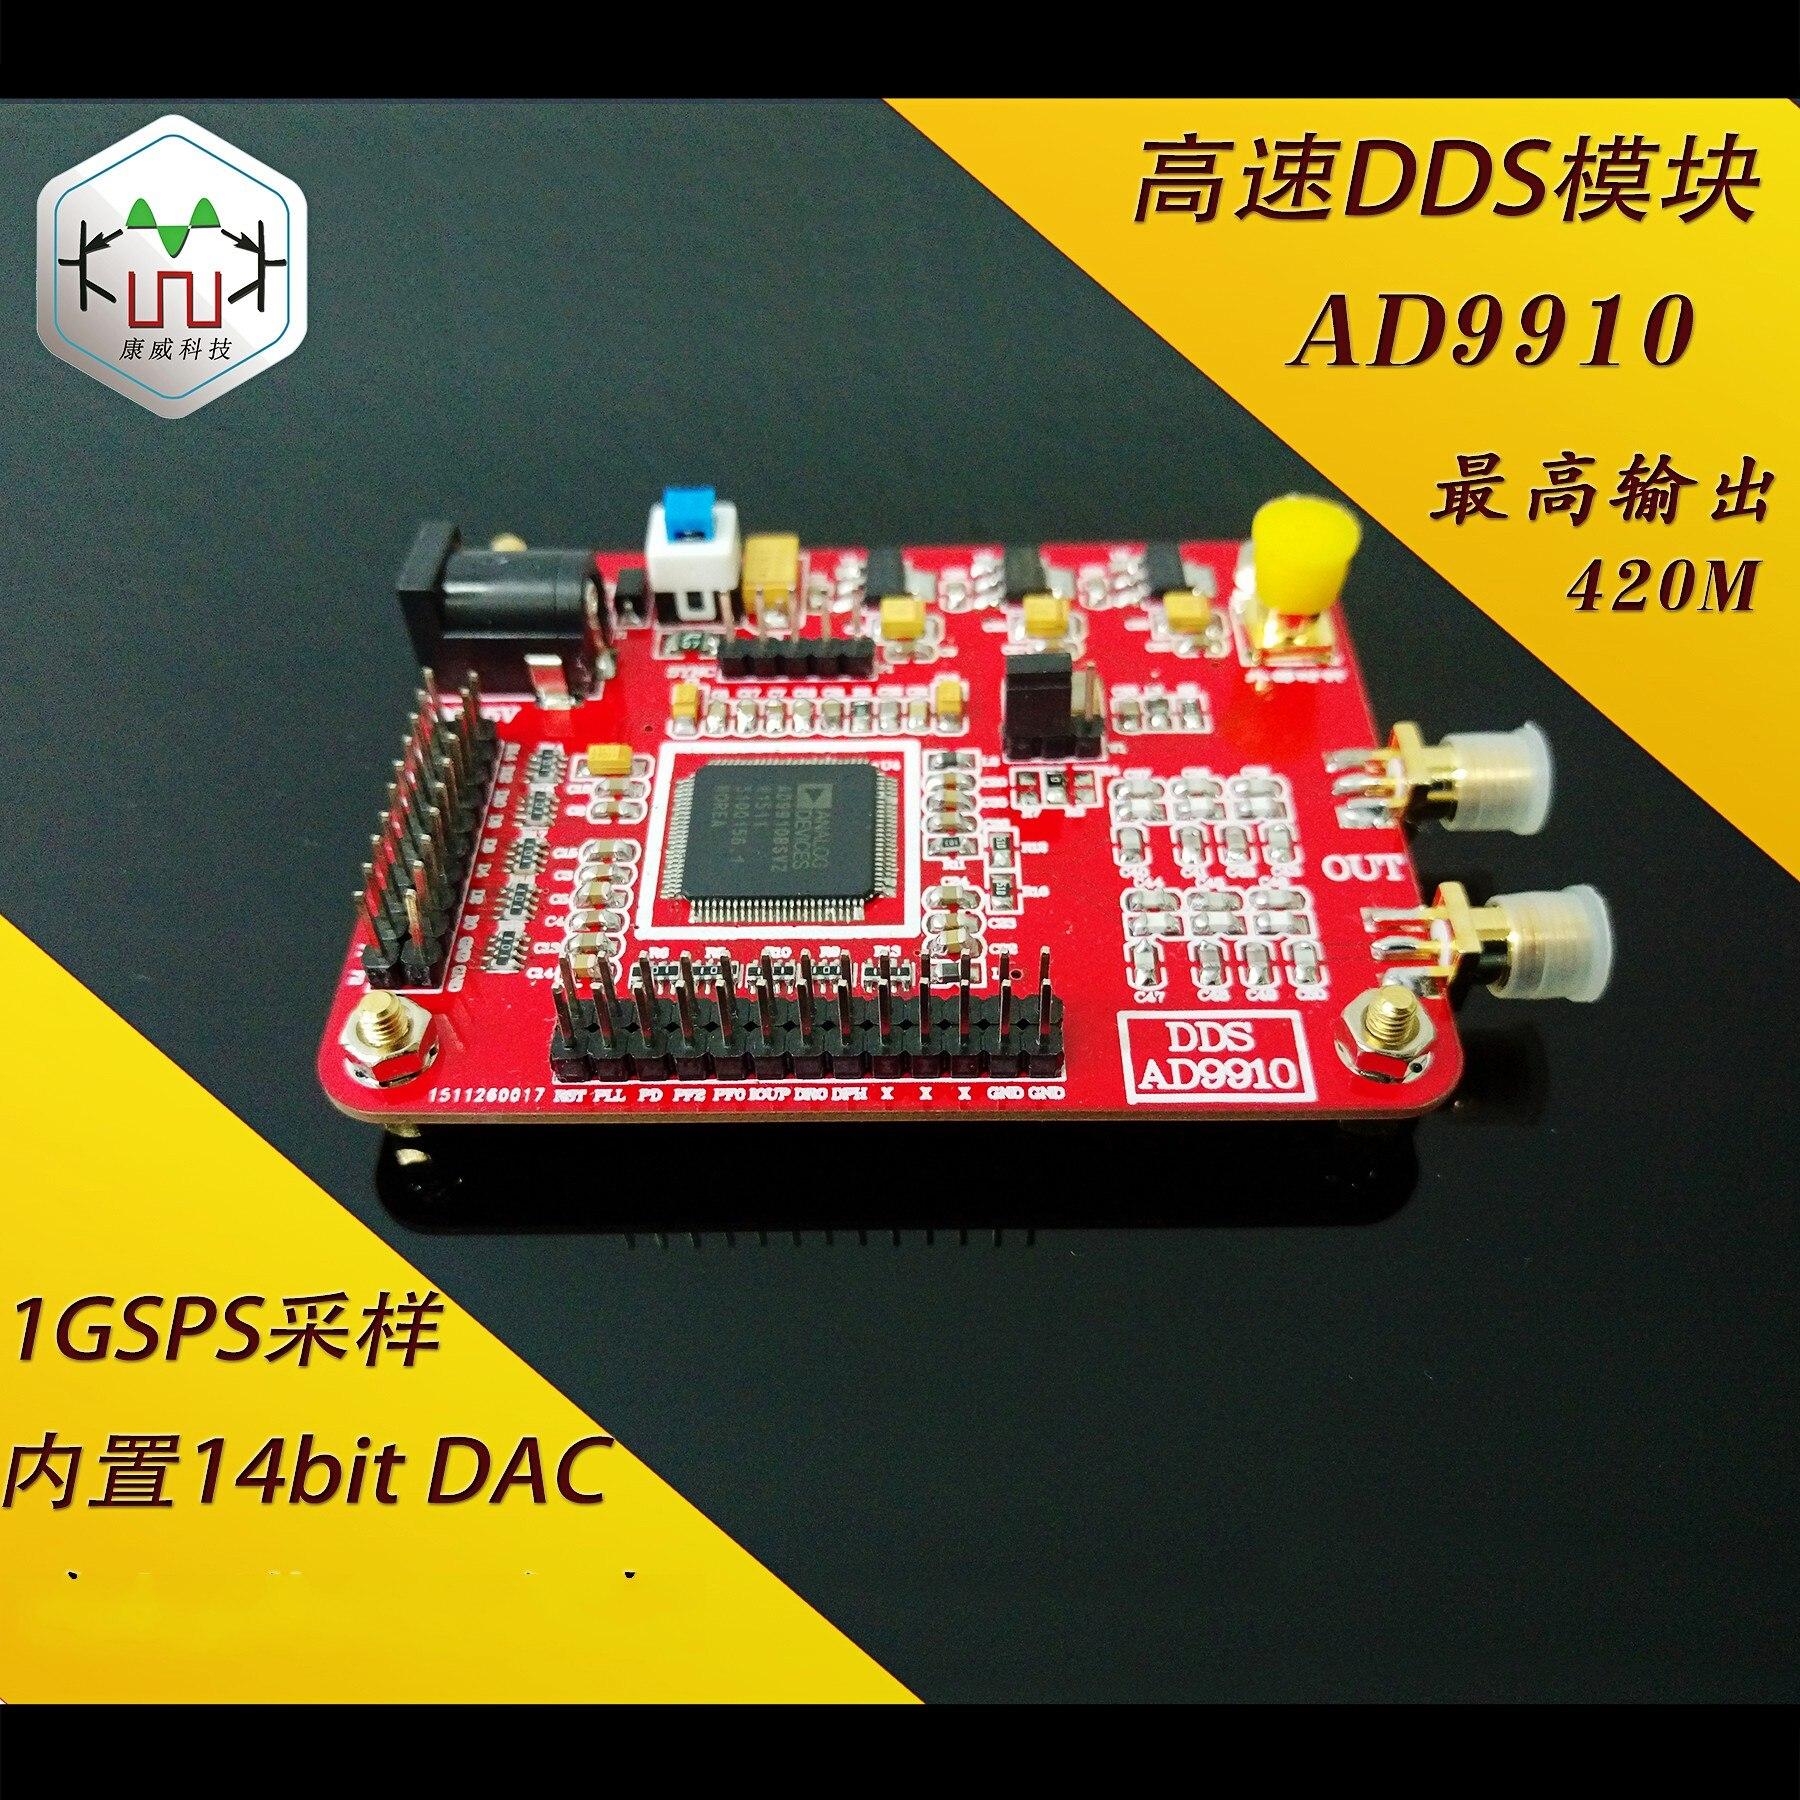 ФОТО AD9910 DDS module 420M 1MSPS highest output sampling frequency signal generator Voltage: 5v-9v